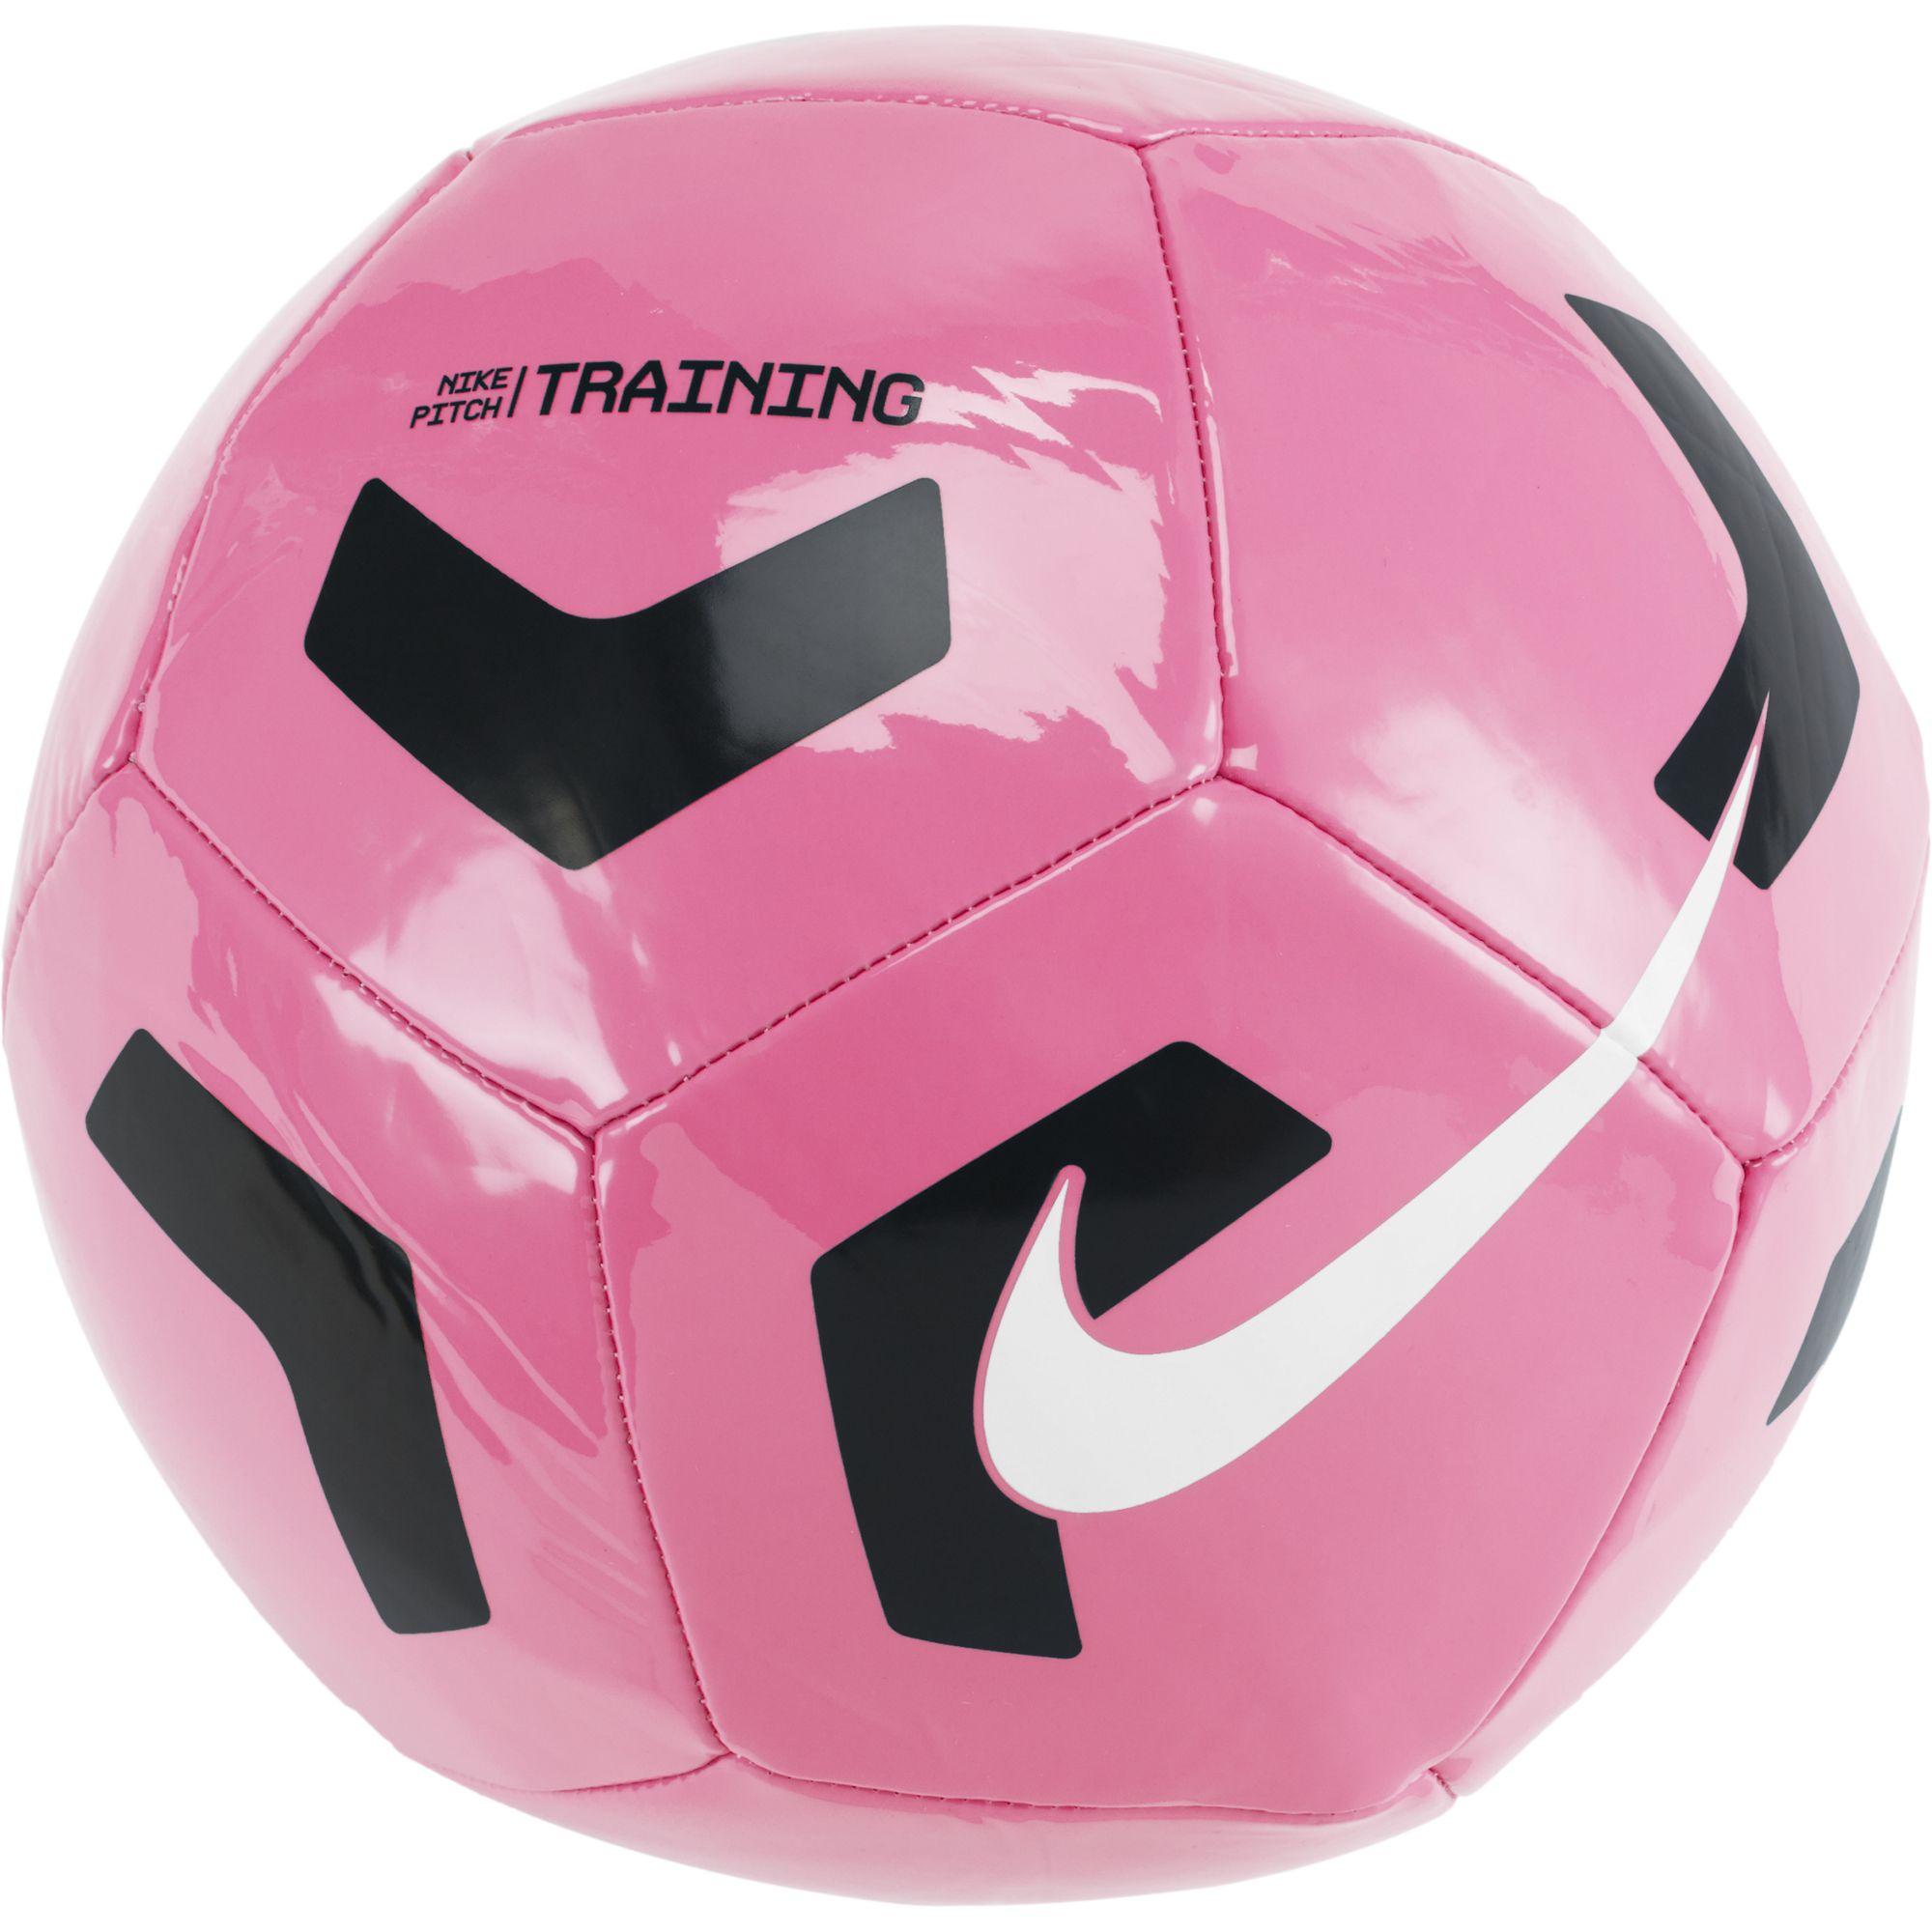 Pitch Training Soccer Ball, Light Rose, swatch